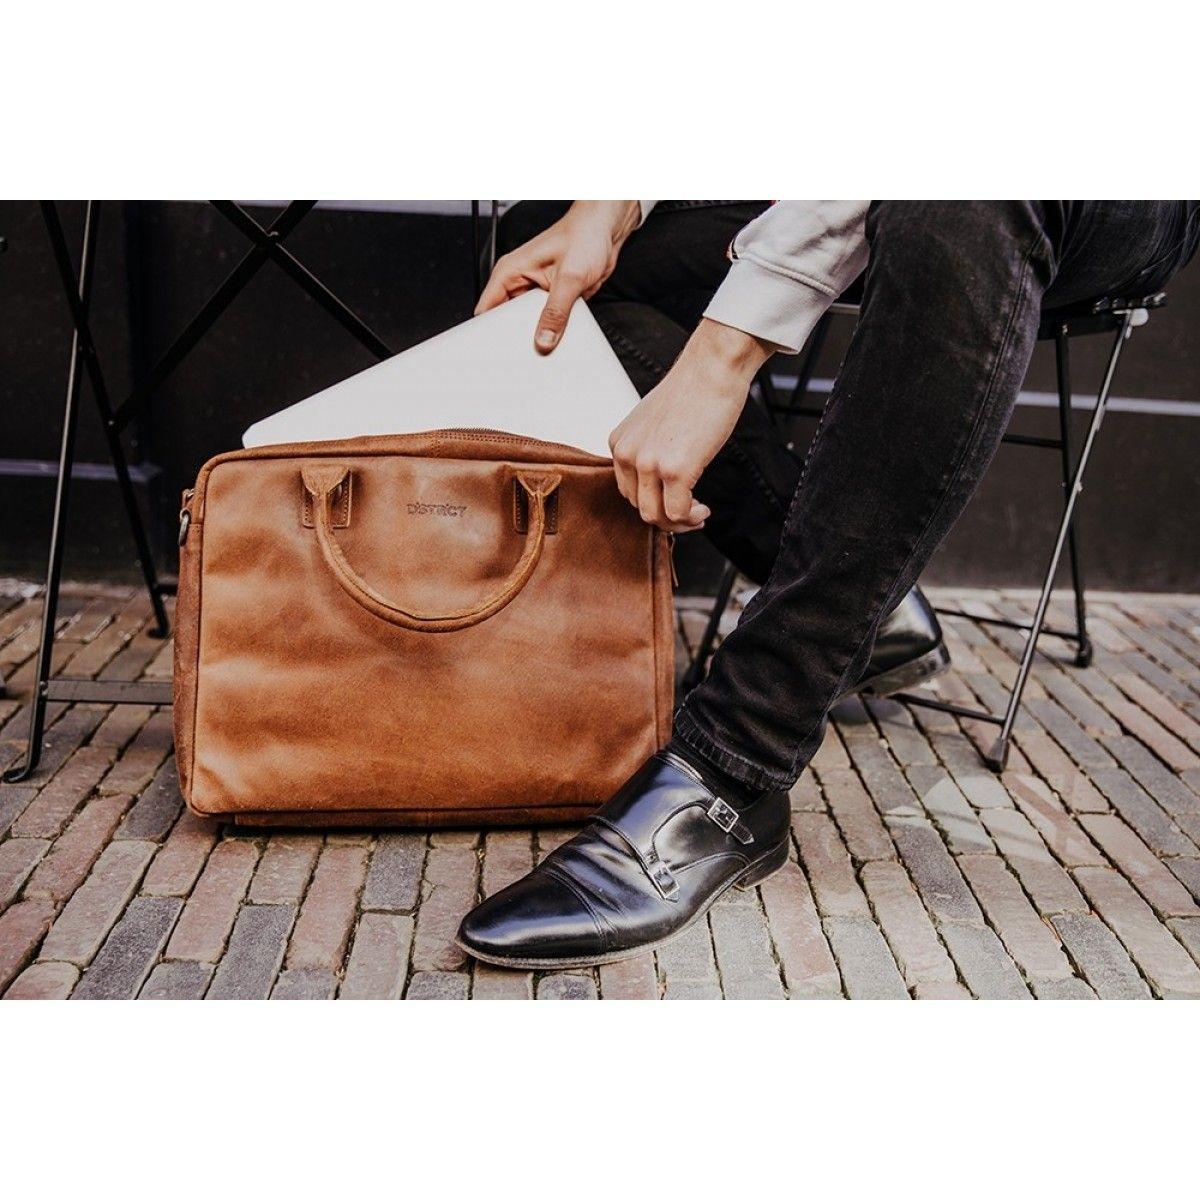 b2b1cb0f1e5 #dbramante #dbramante1928 #rosenborg #leatherlaptopbag #leatherbag #black  #zwart #laptoptas #…   LAPTOP BAGS   Bags,…